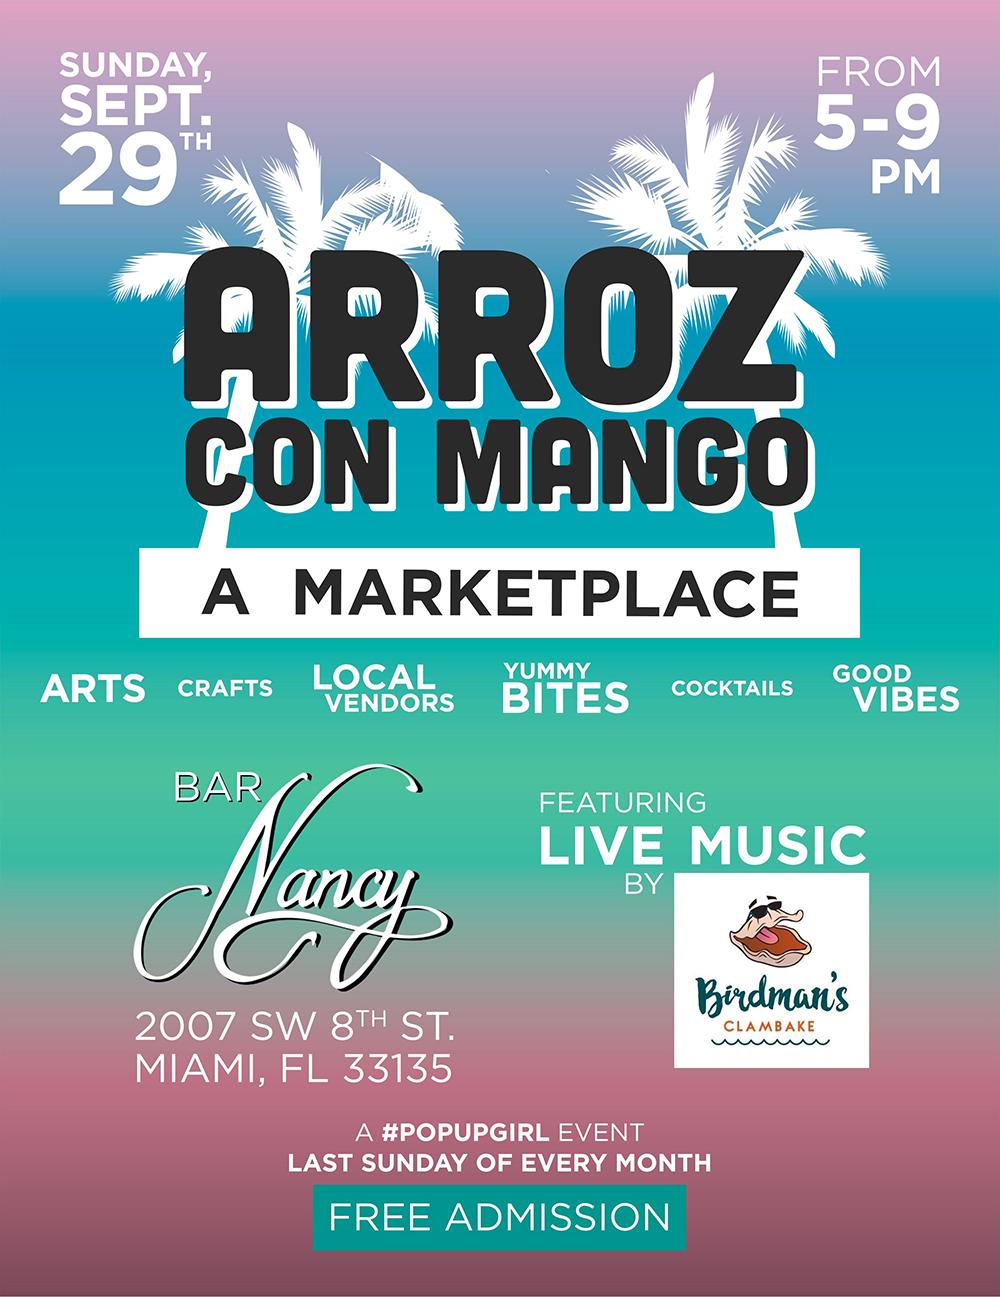 Arroz Con Mango! Featuring Birdman's Clambake!